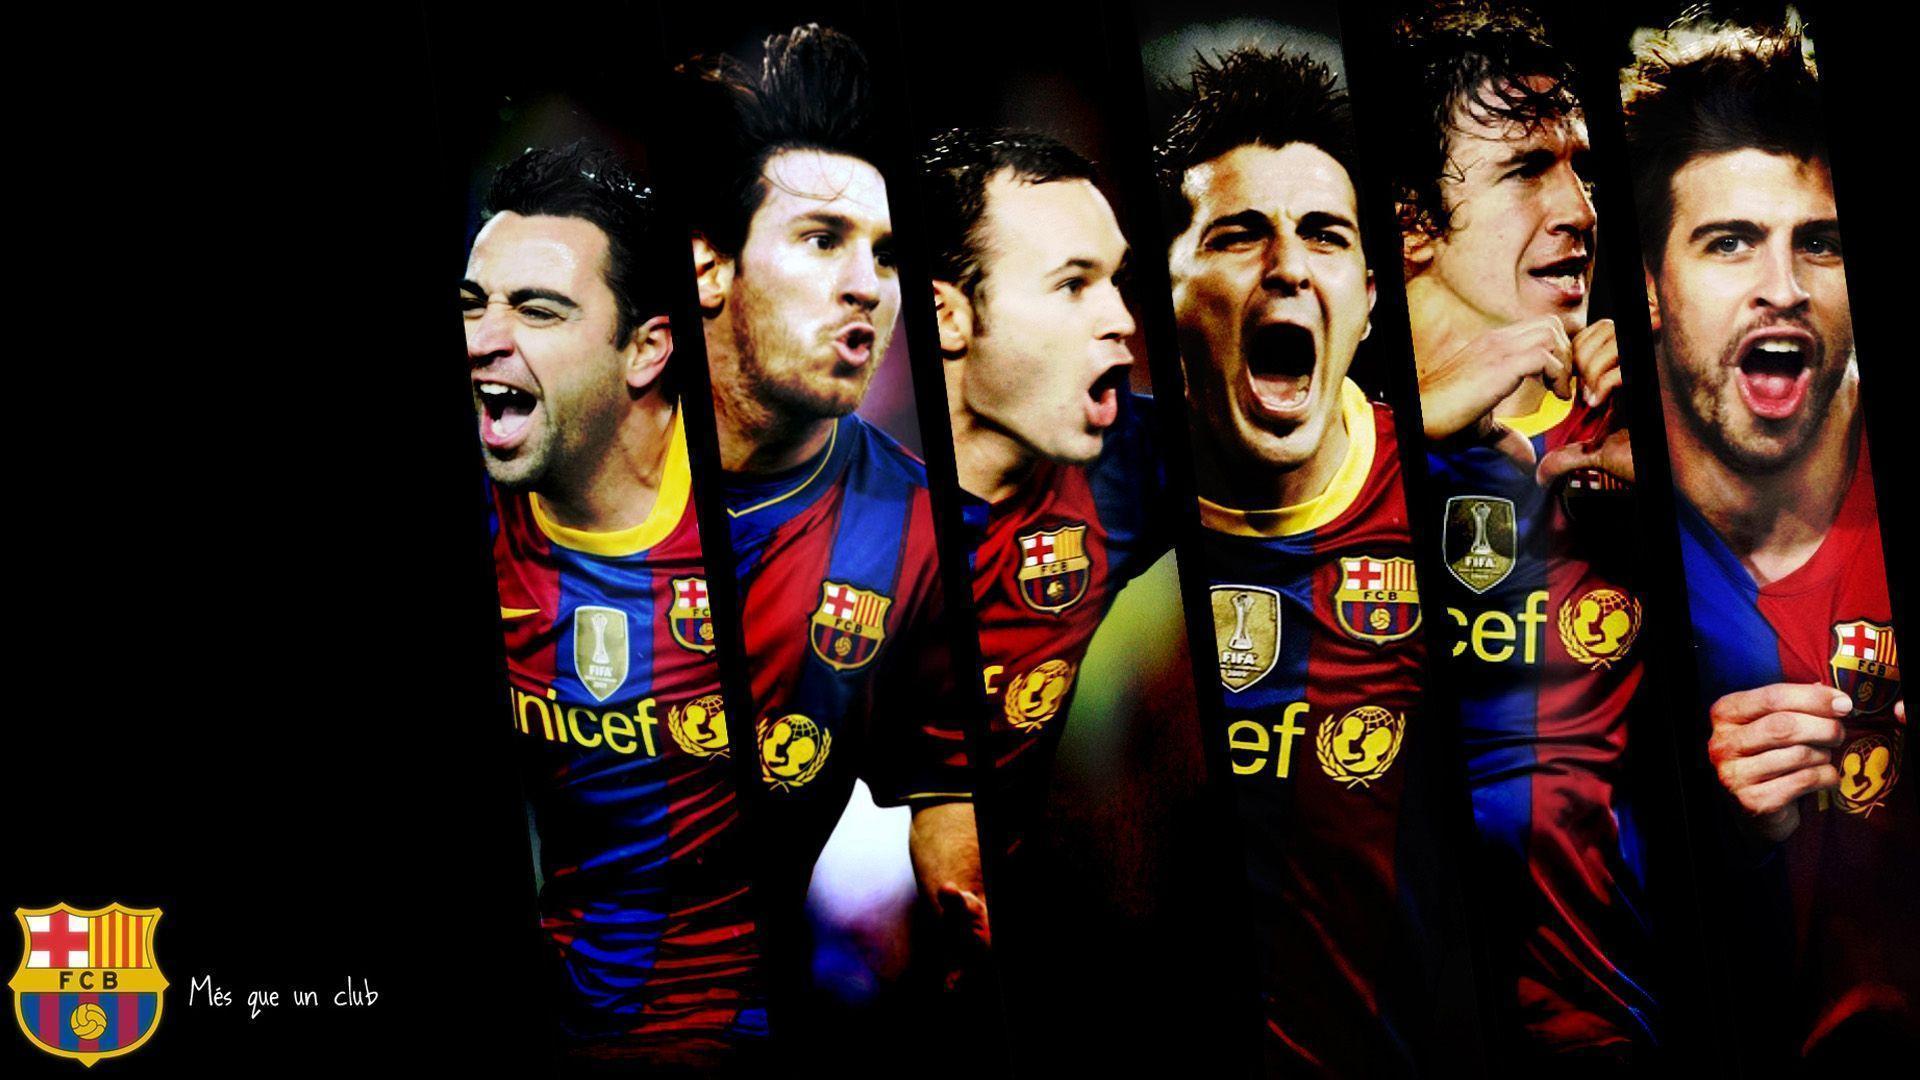 FC Barcelona National Football Team Background 8